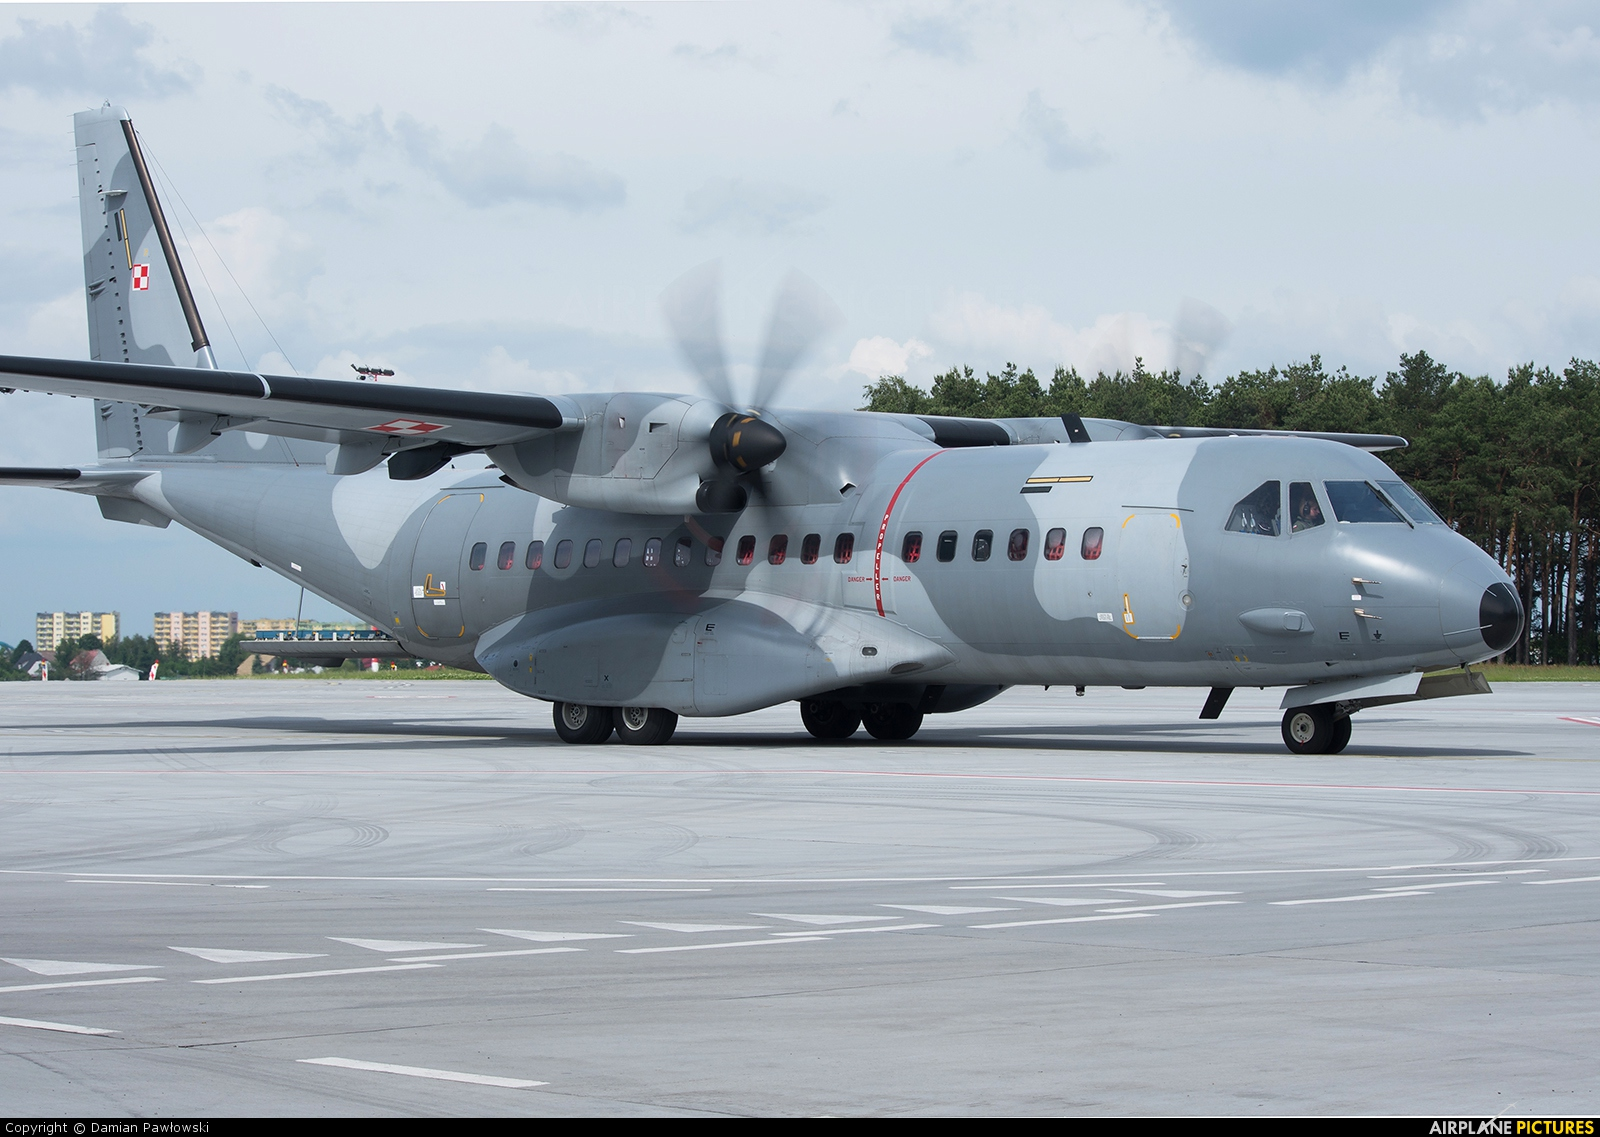 Poland - Air Force 023 aircraft at Bydgoszcz - Szwederowo